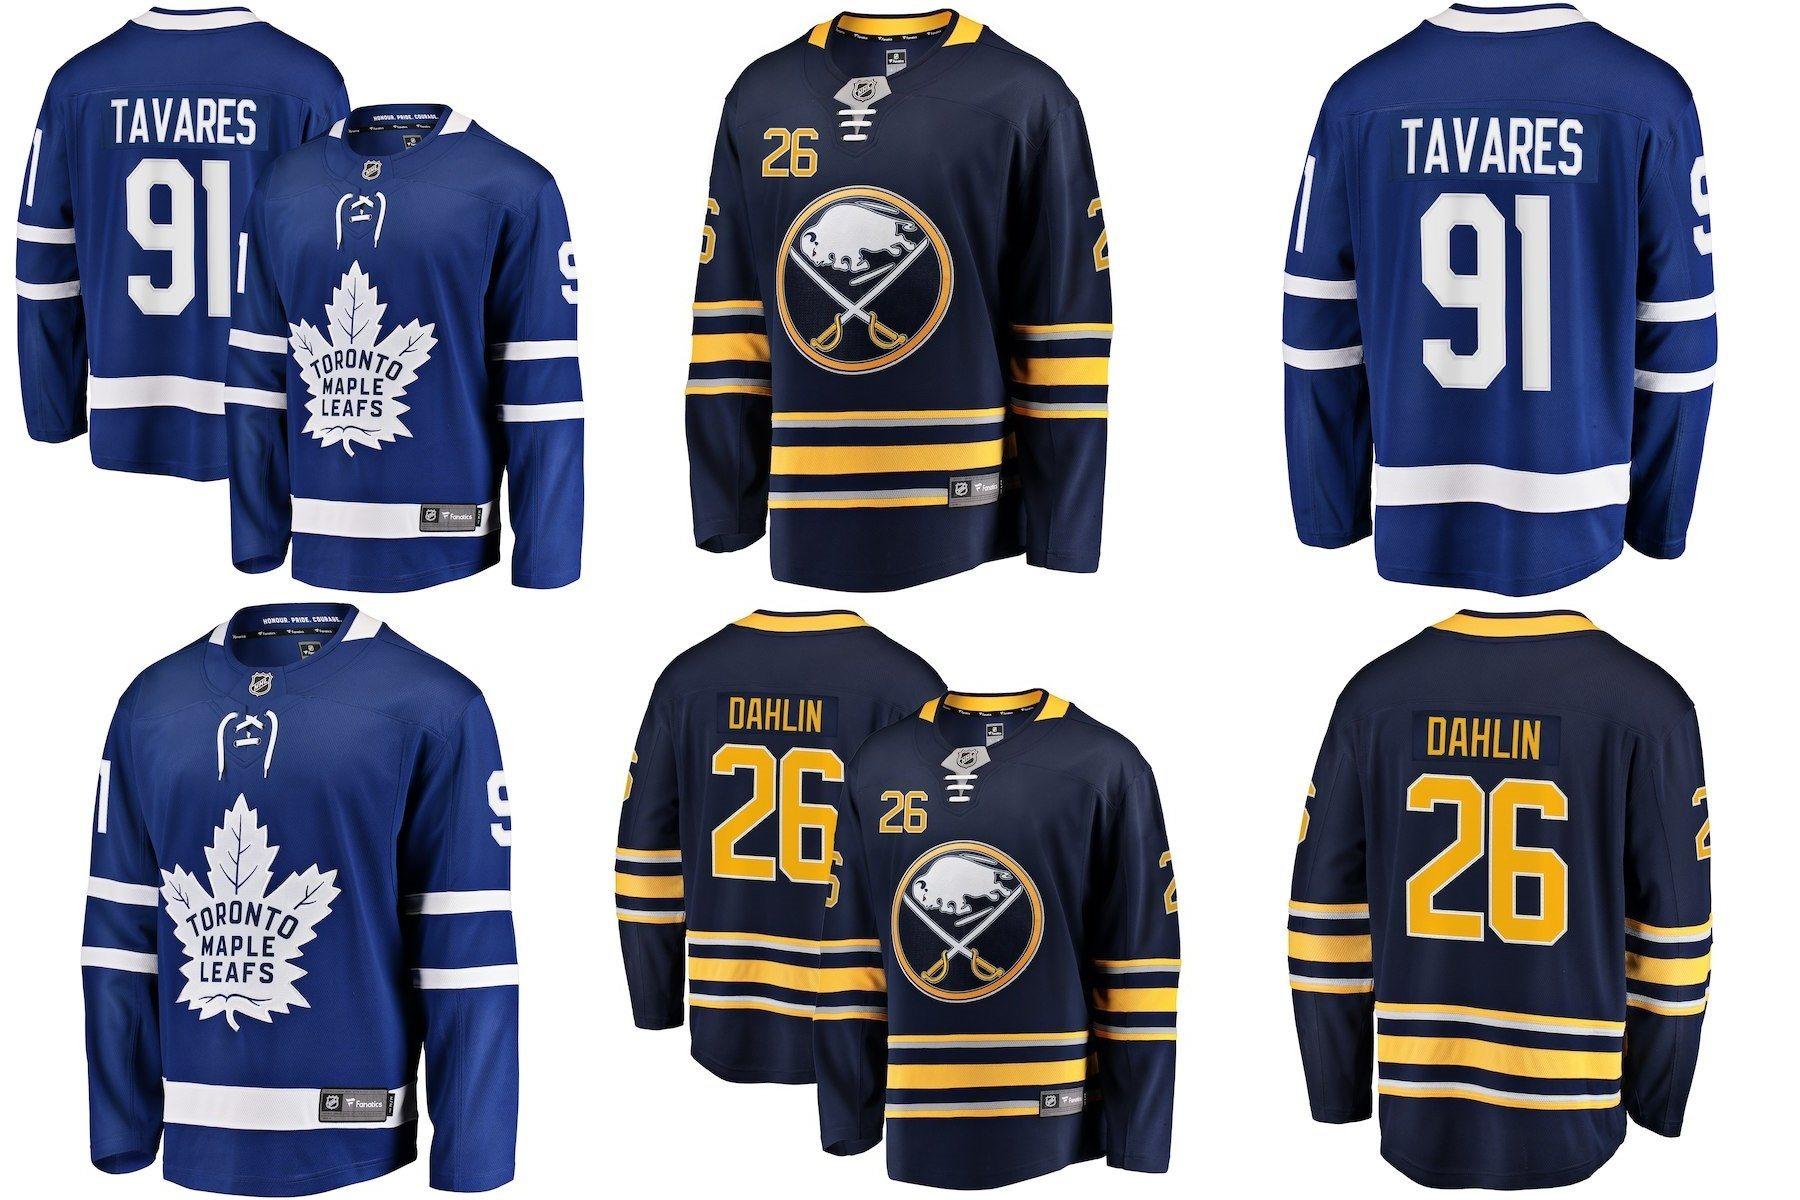 separation shoes 8cb67 81f9b [Hot Item] Toronto Maple Leafs John Tavares Buffalo Rasmus Dahlin Hockey  Jerseys